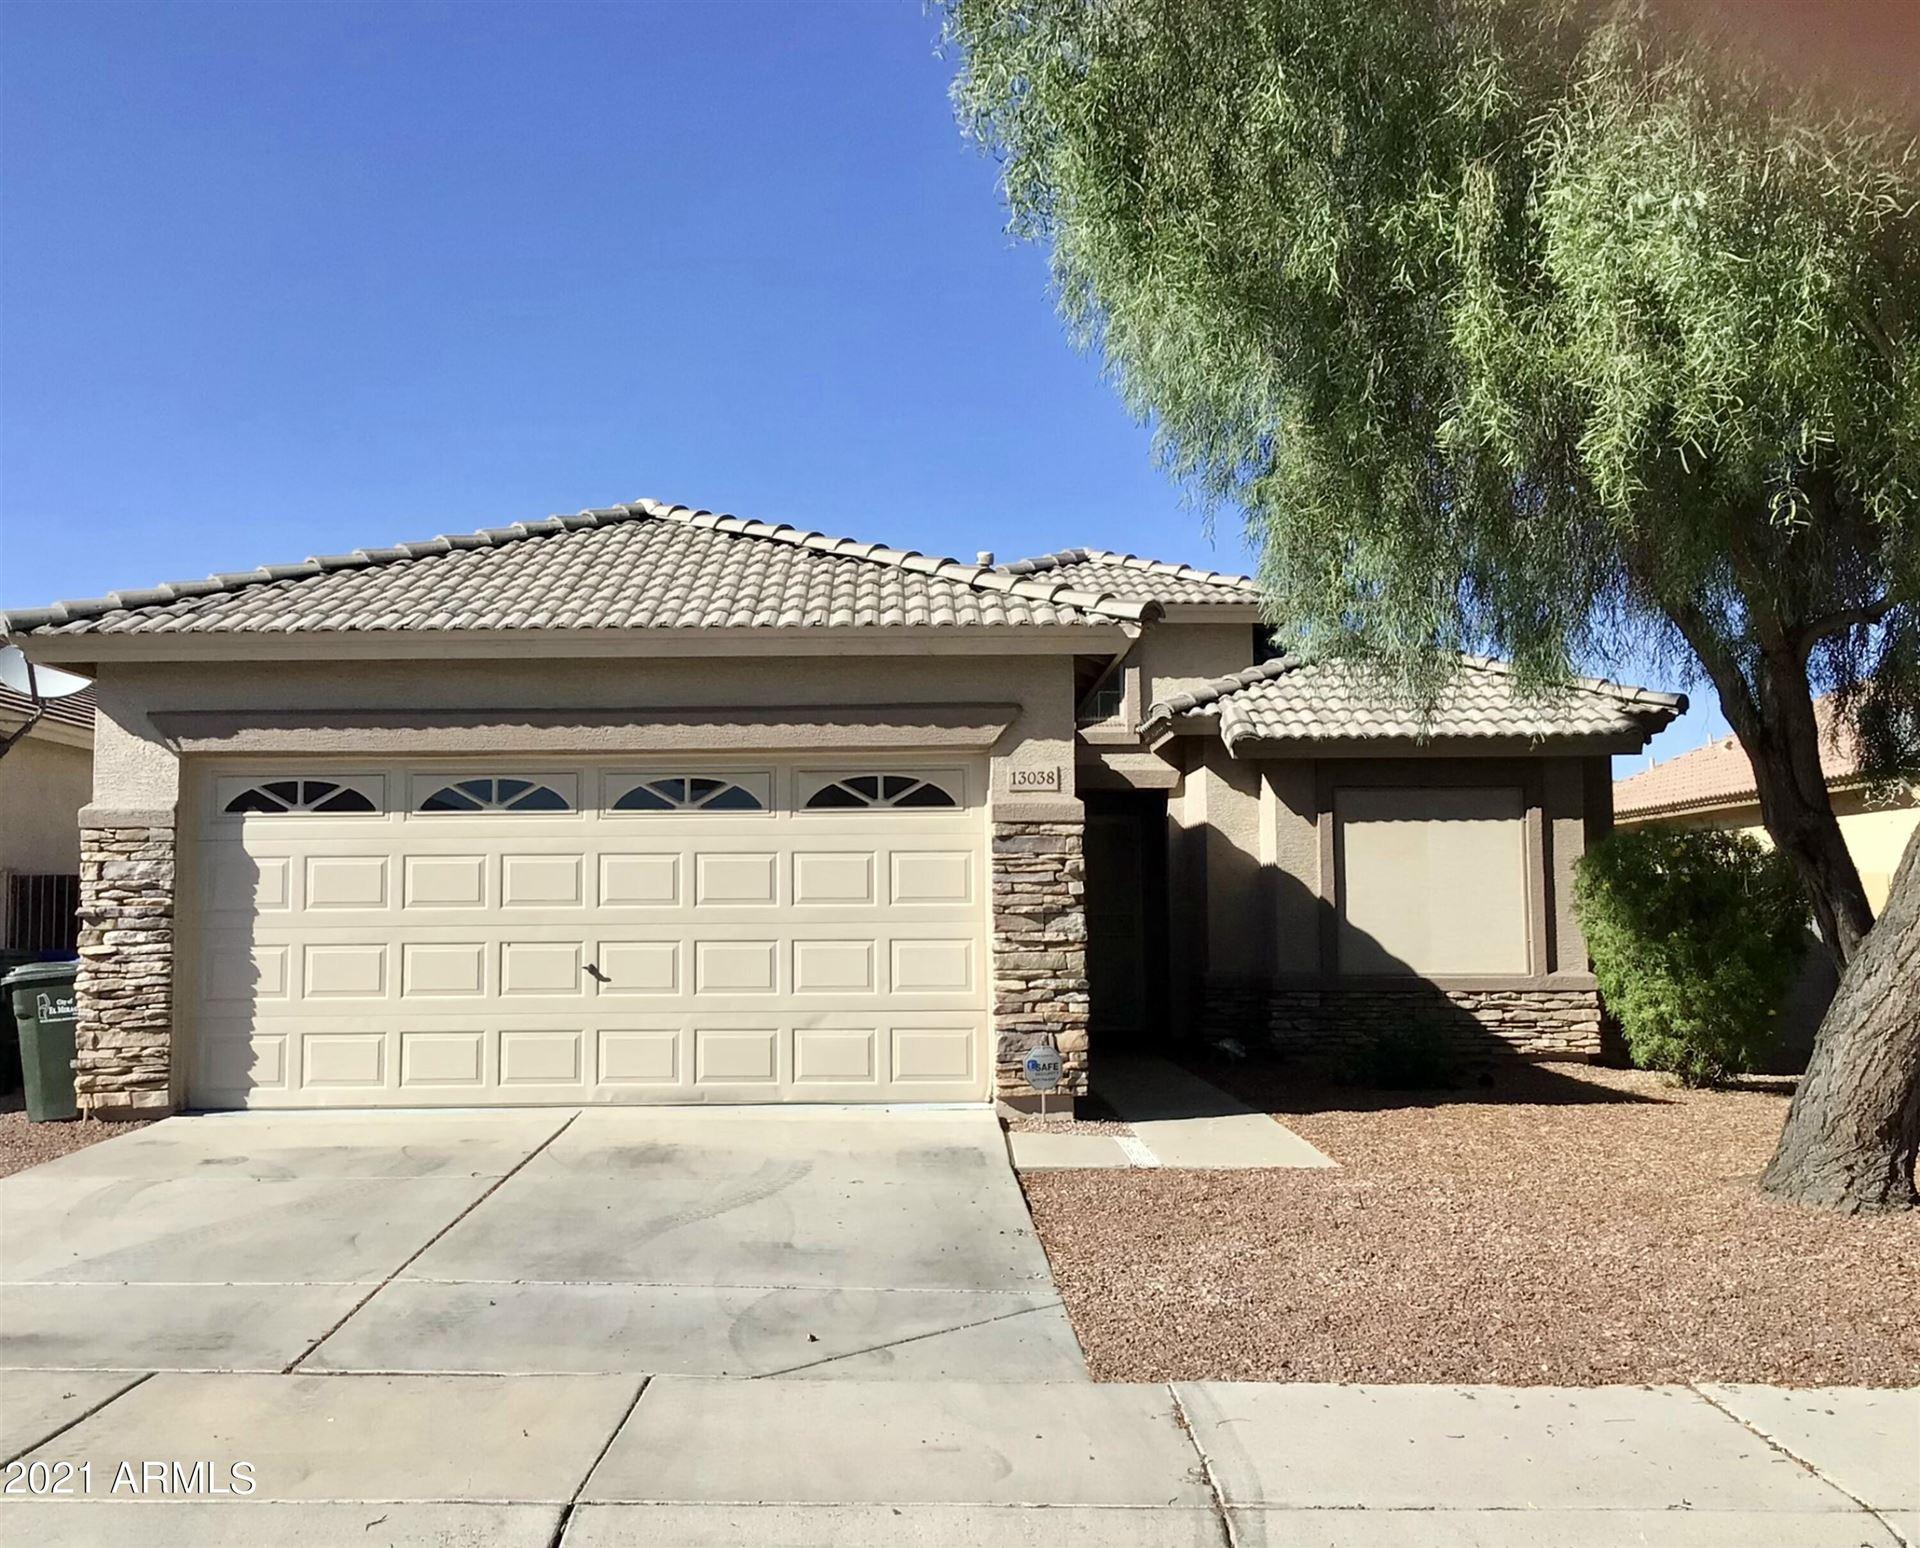 Photo of 13038 W ASTER Drive, El Mirage, AZ 85335 (MLS # 6296704)